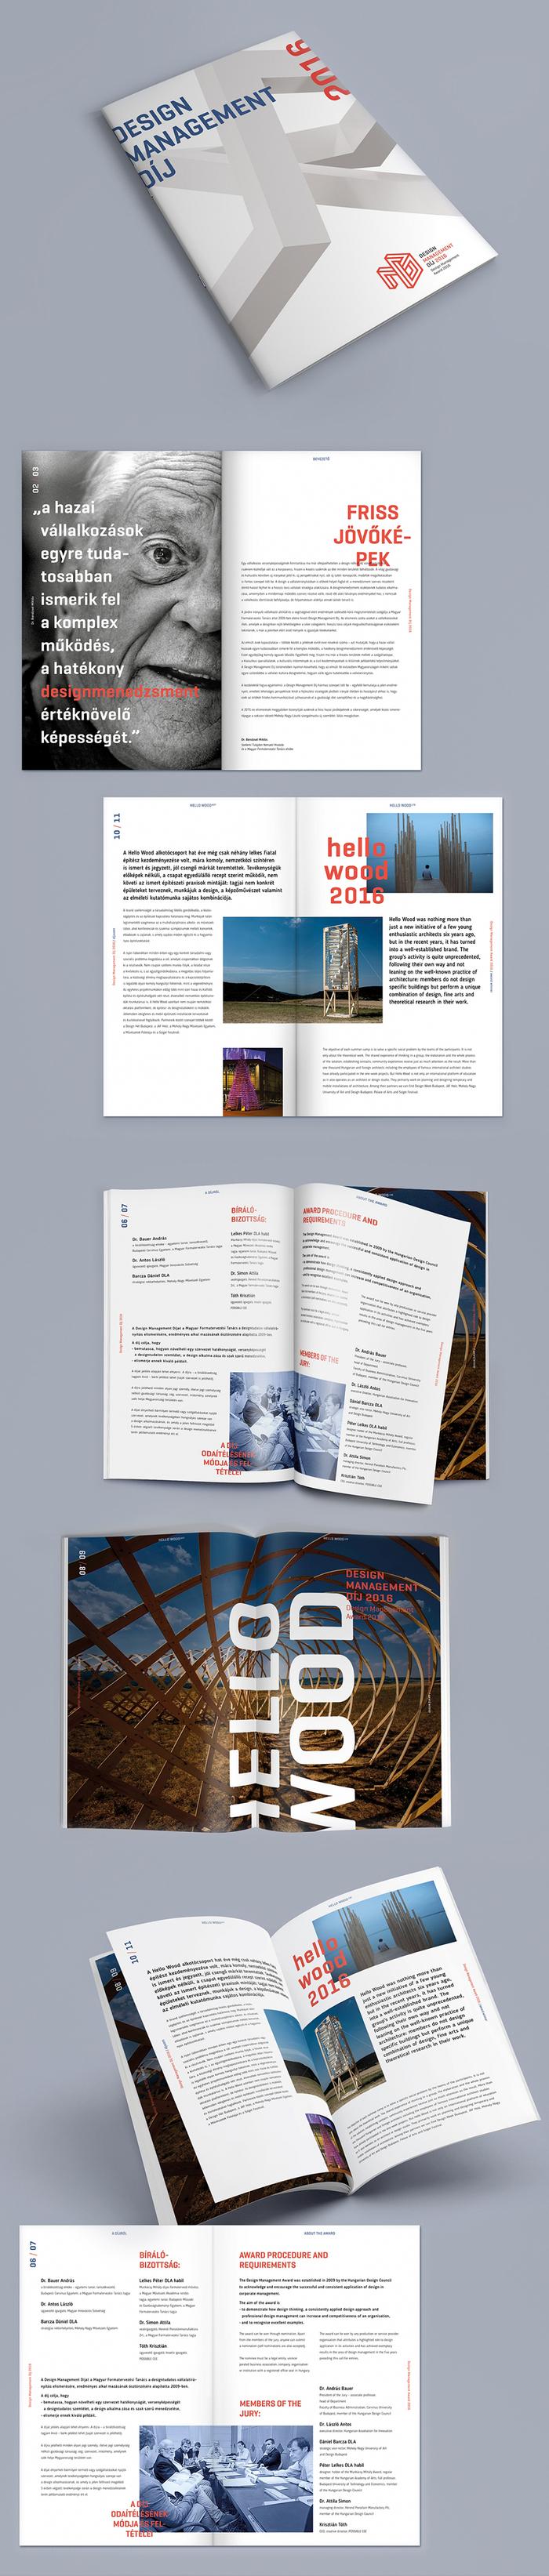 Design Management Award 6